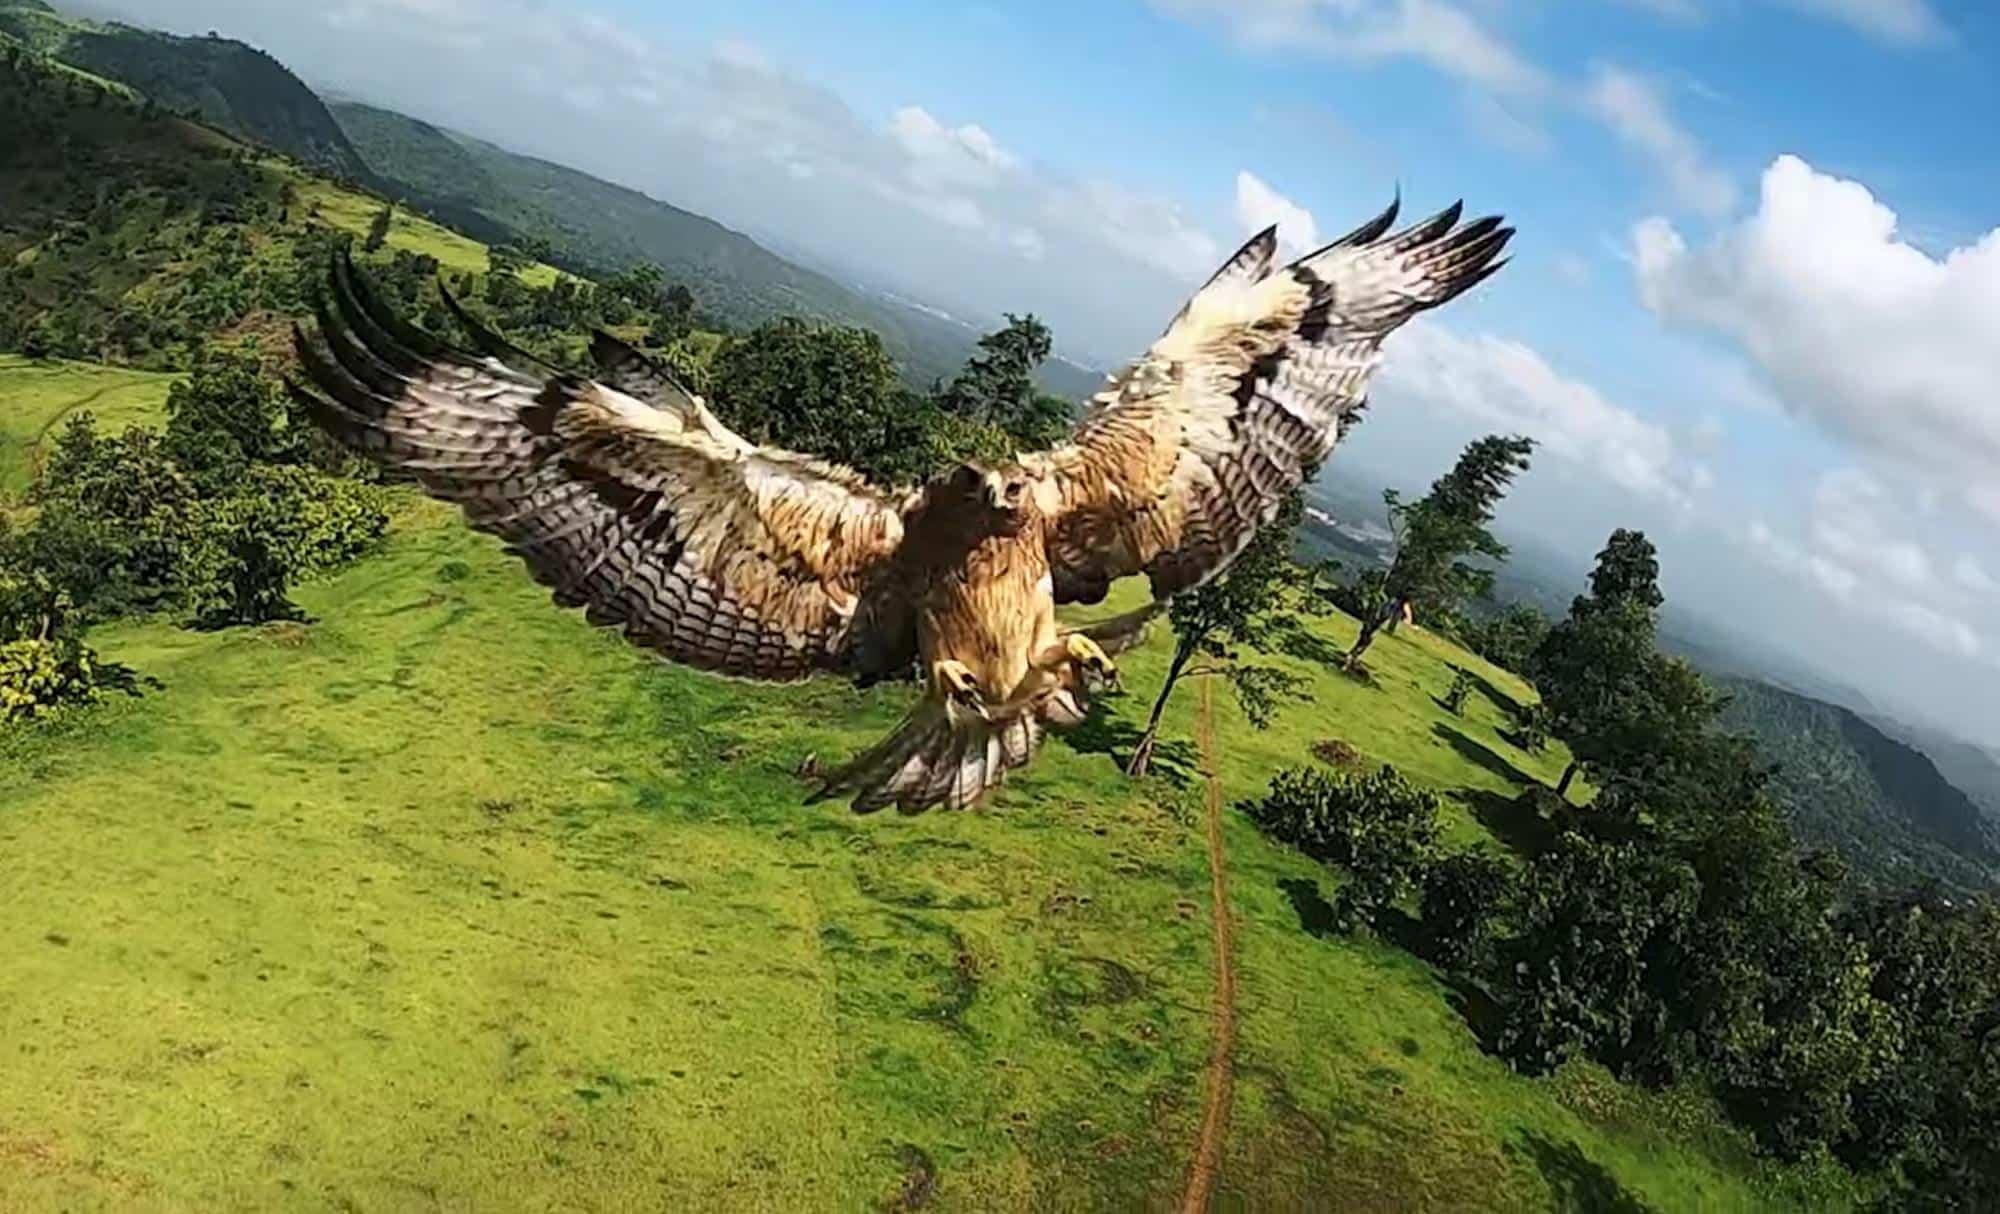 Bird of prey attacks FPV drone in midair